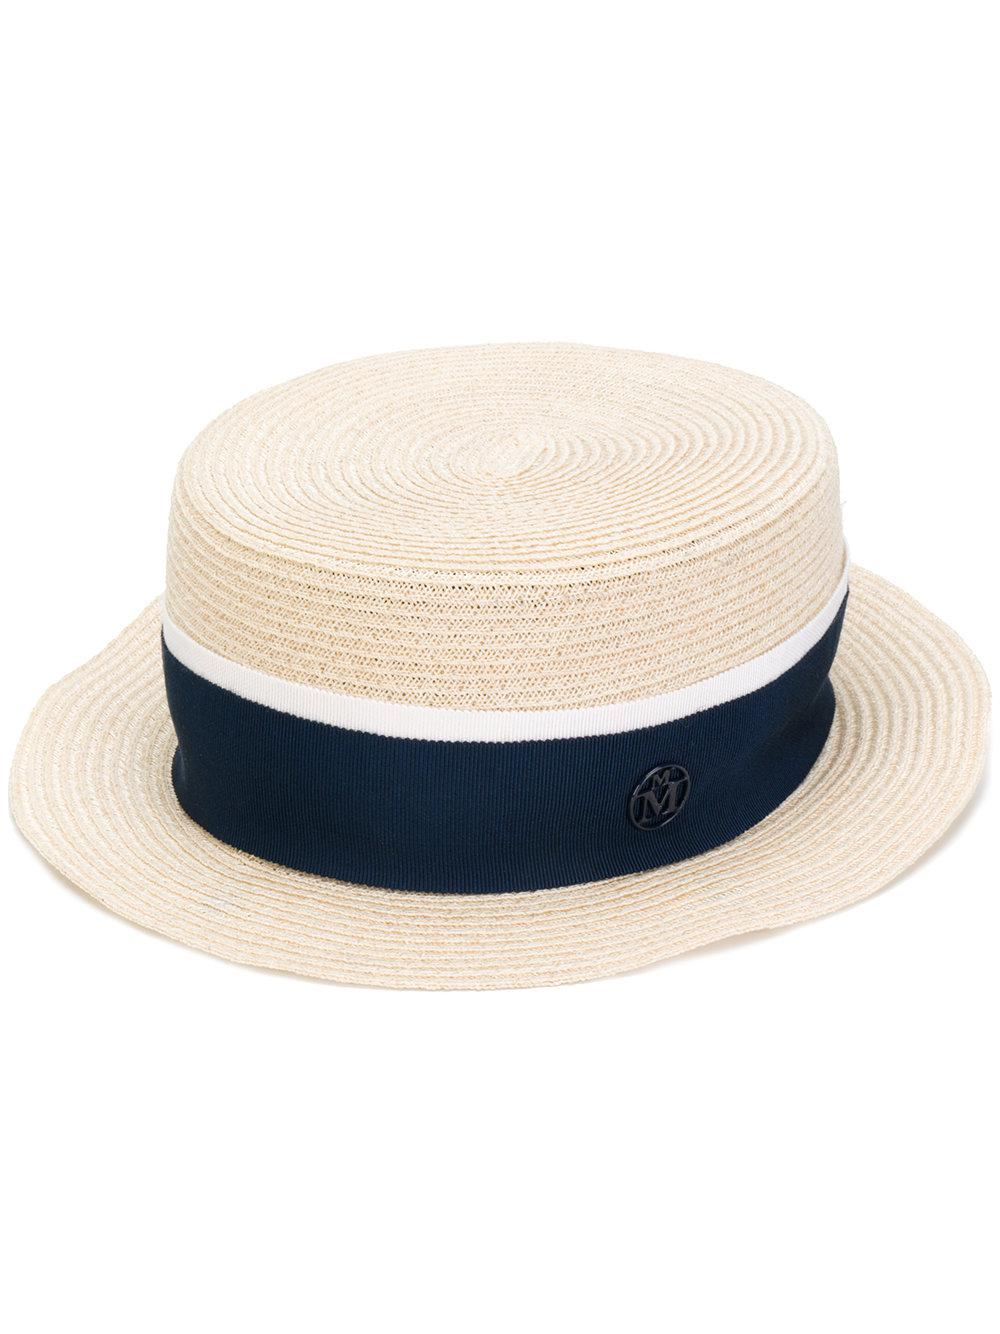 65d864b055d Lyst - Maison Michel Auguste Hat Hemp in Blue